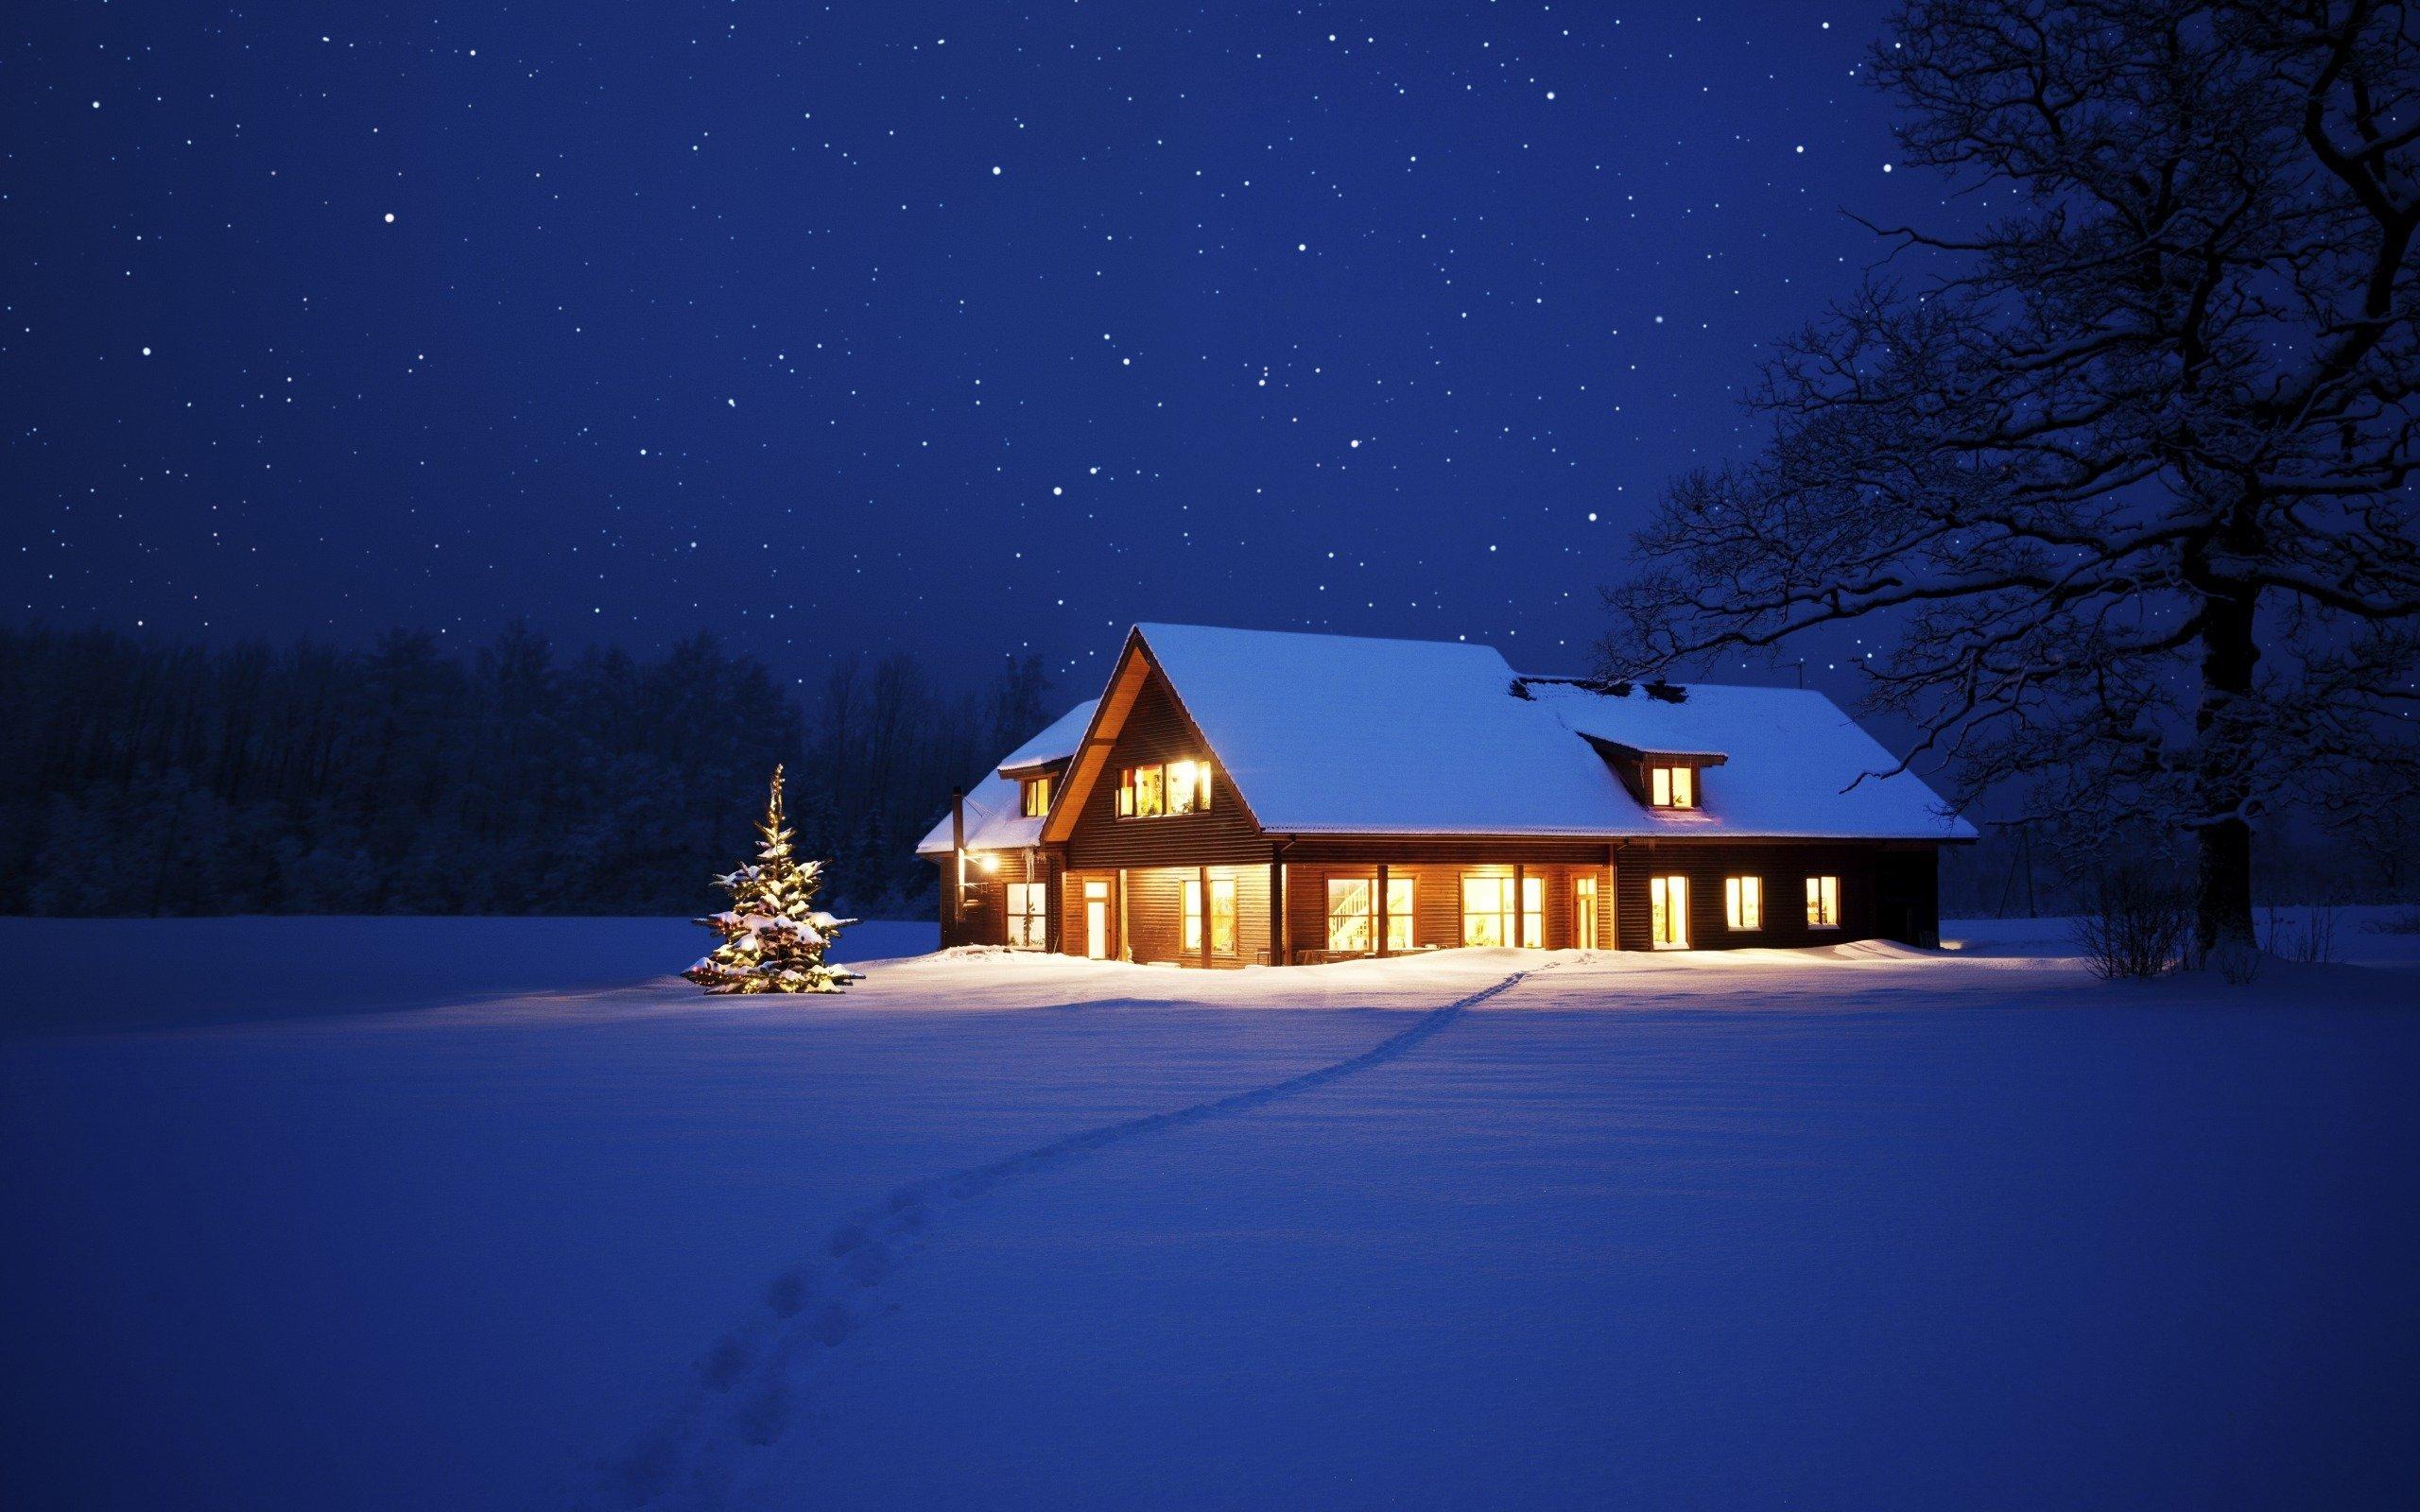 Beautiful Cool Winter Night Hd Wallpaper